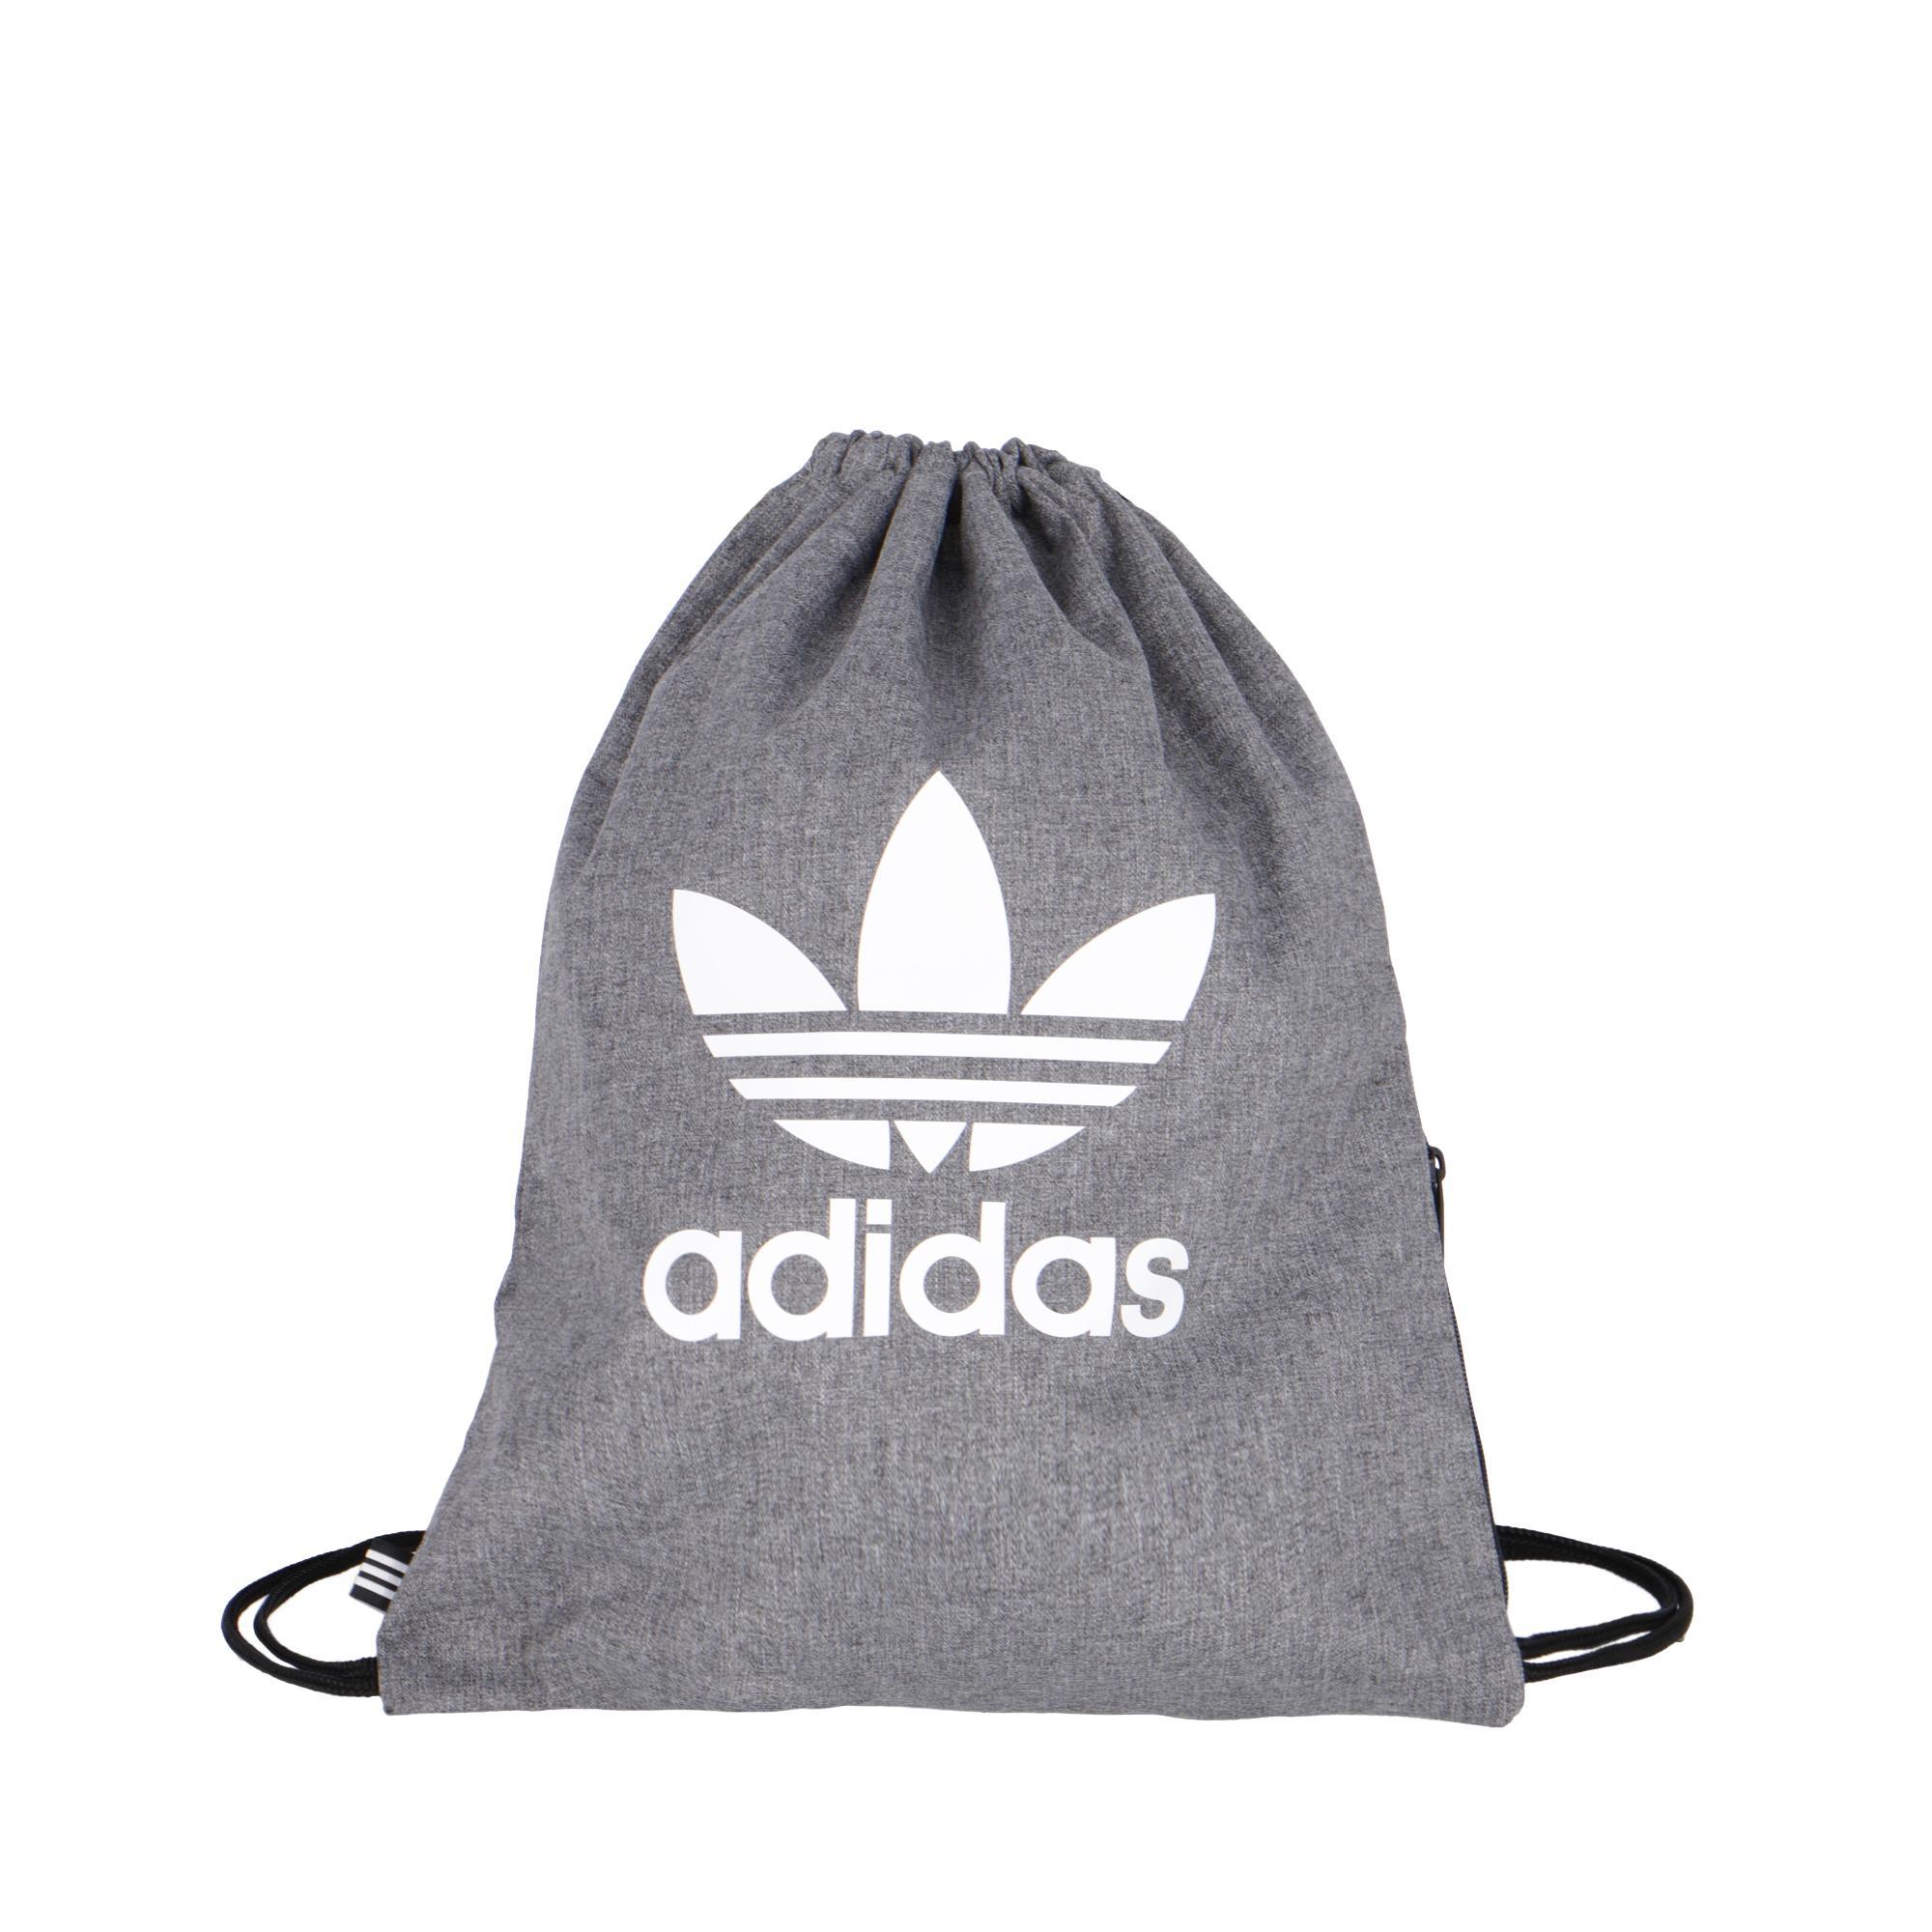 4b39fa054b Adidas Gymsack Trefoil Black White